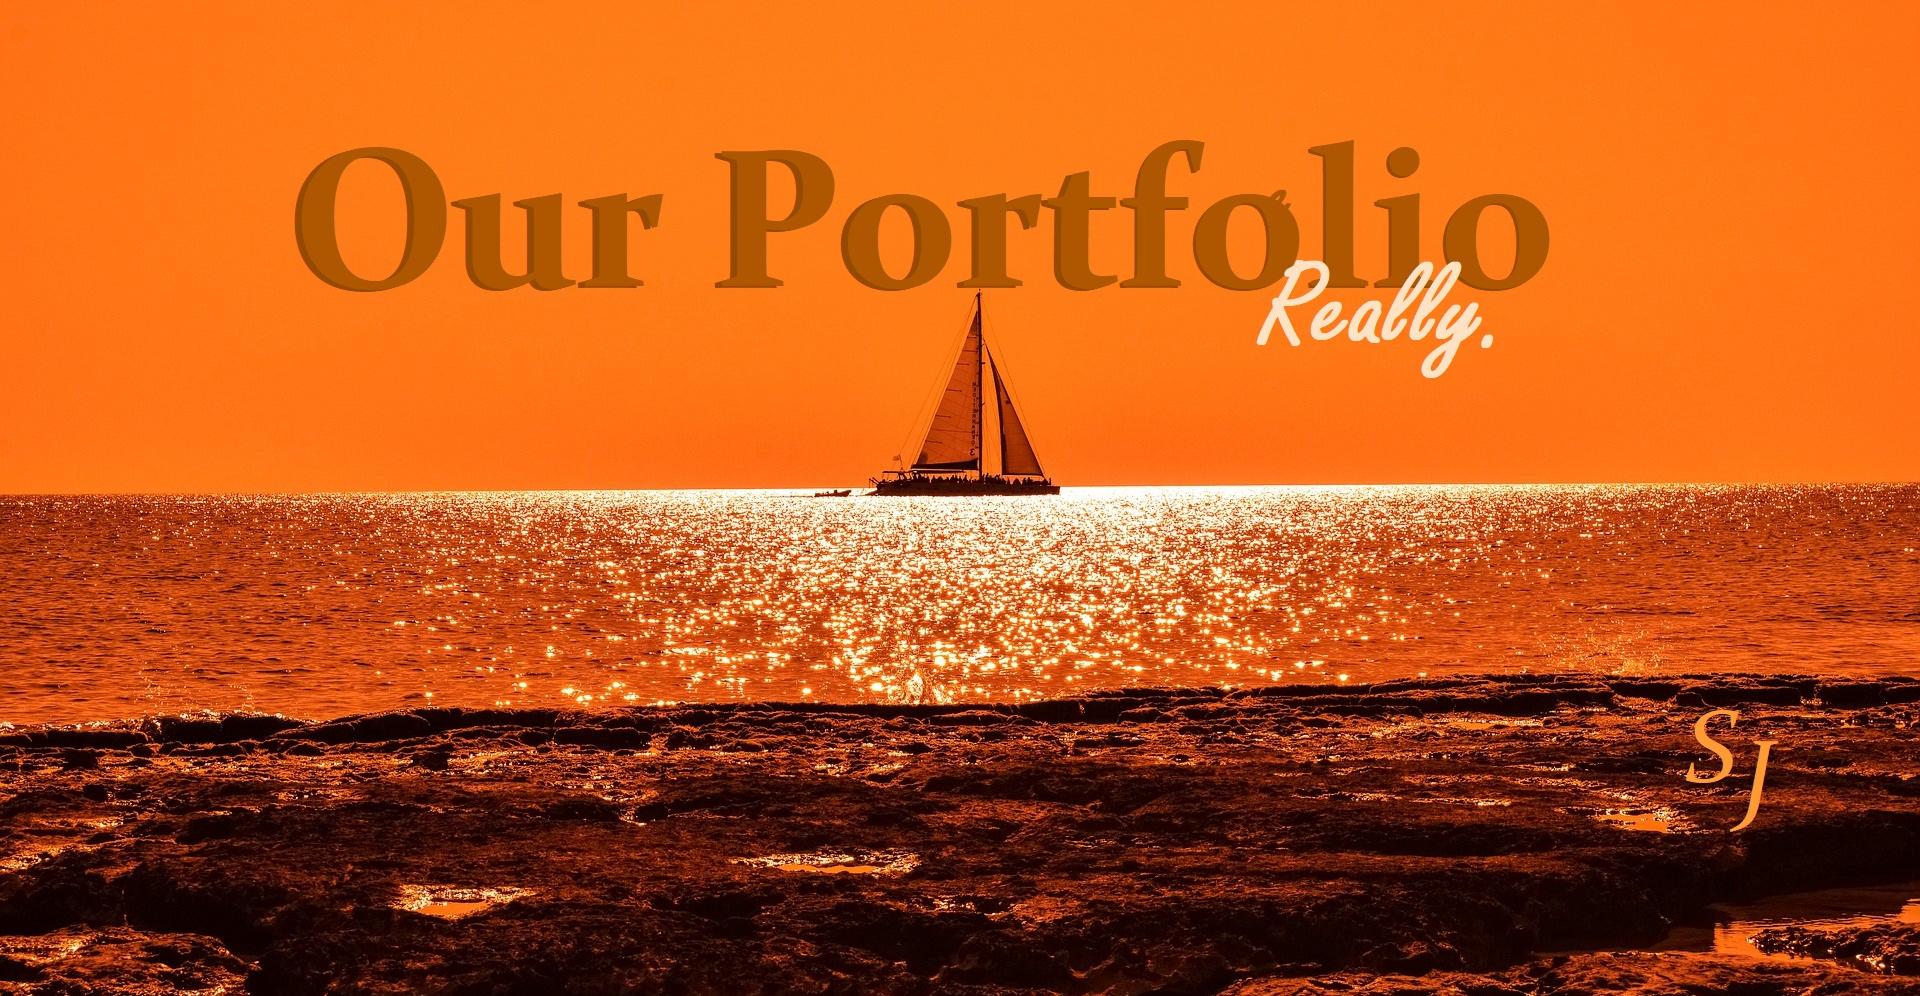 Our Portfolio 4